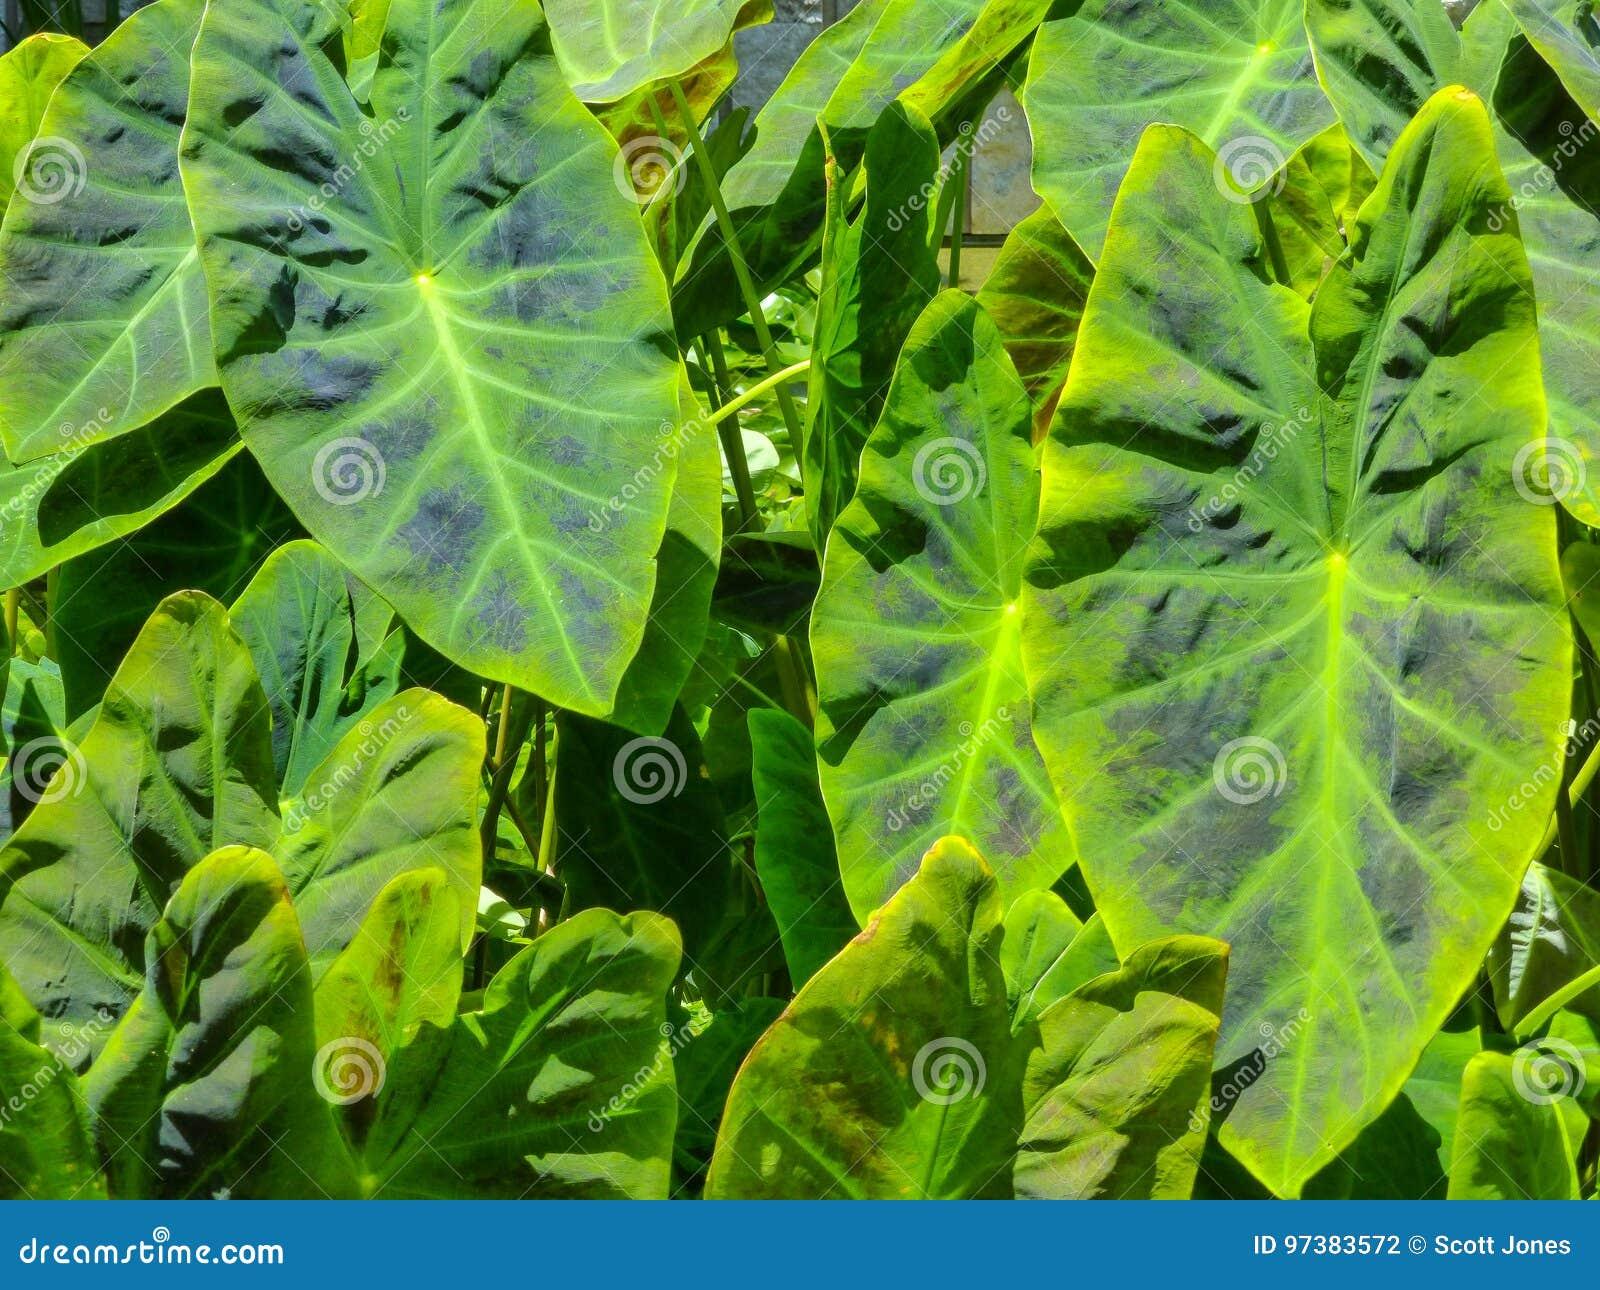 Elephant Ear Plant Stock Photo Image Of Plant Poisonous 97383572